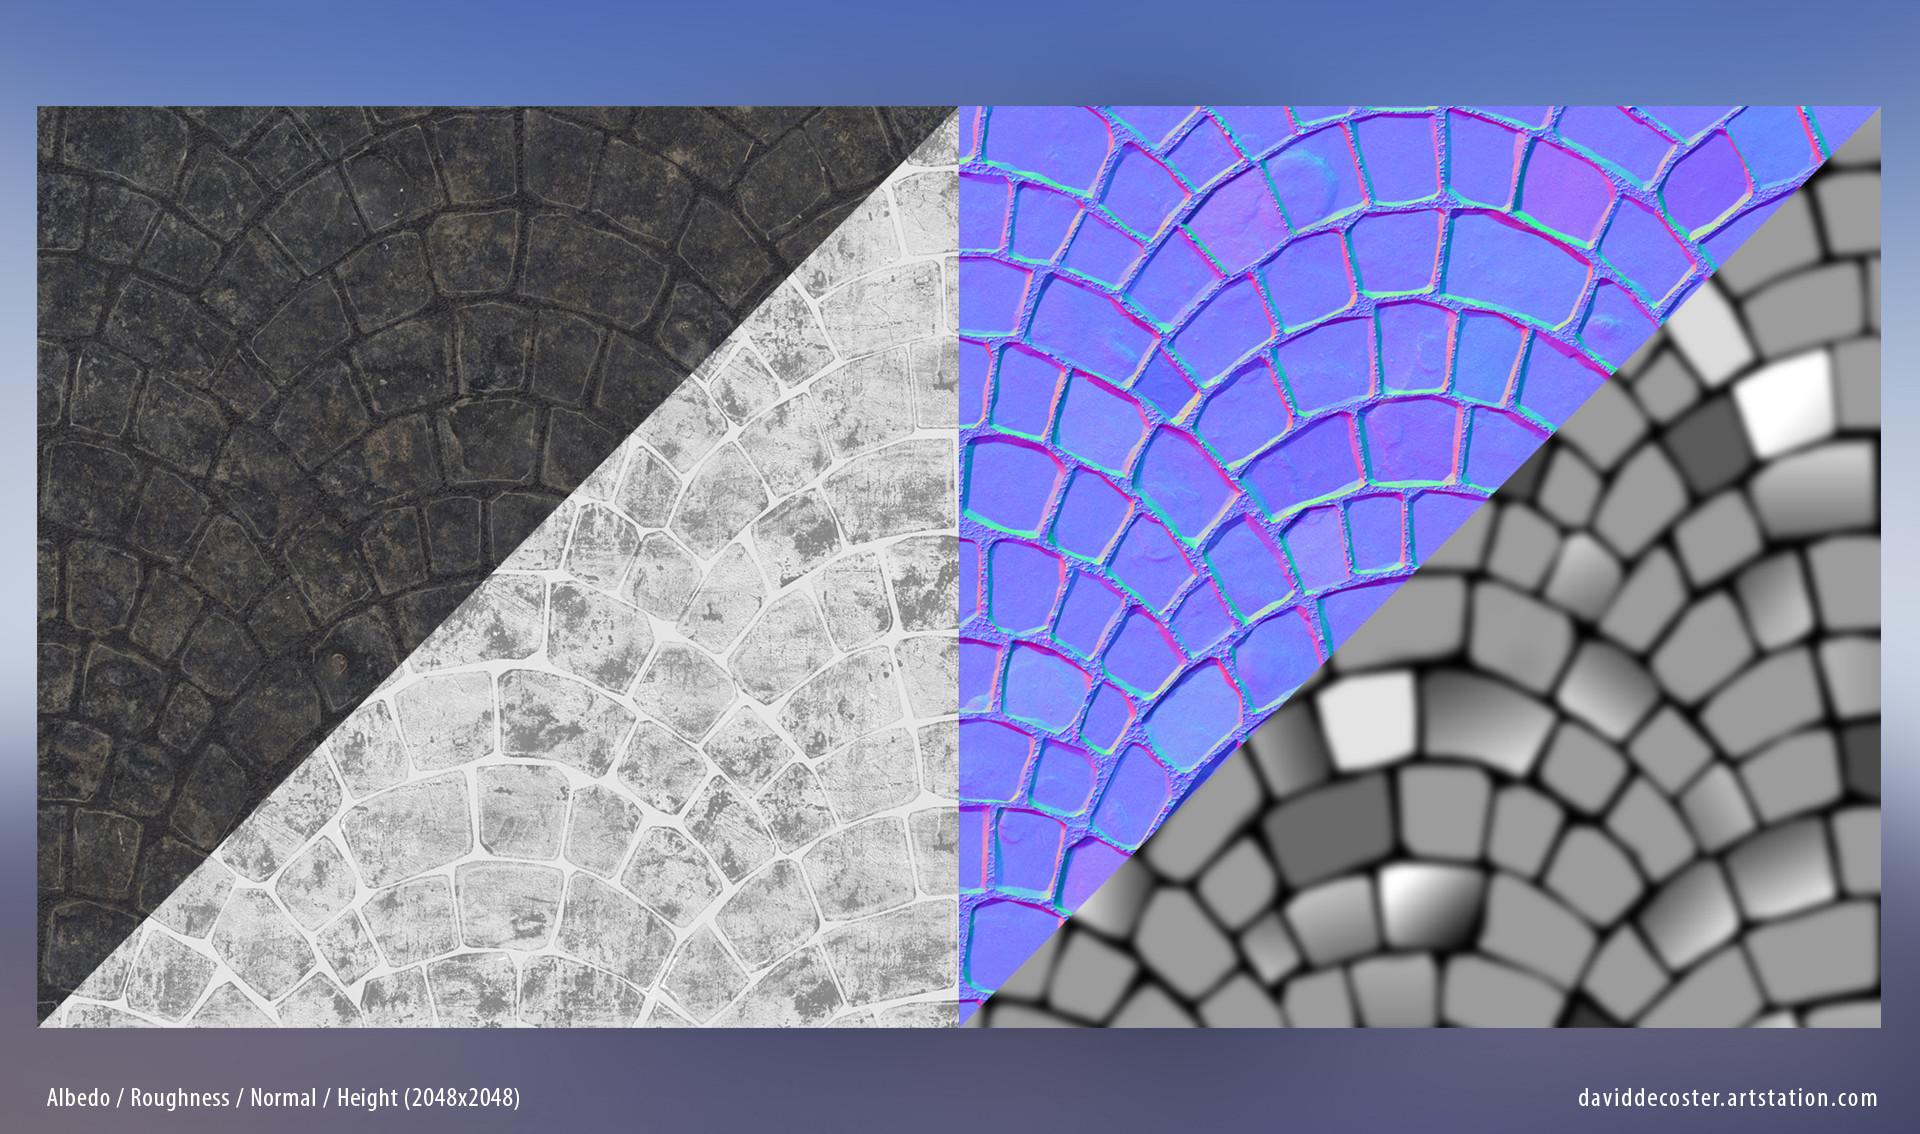 David decoster cobblestone fan textures